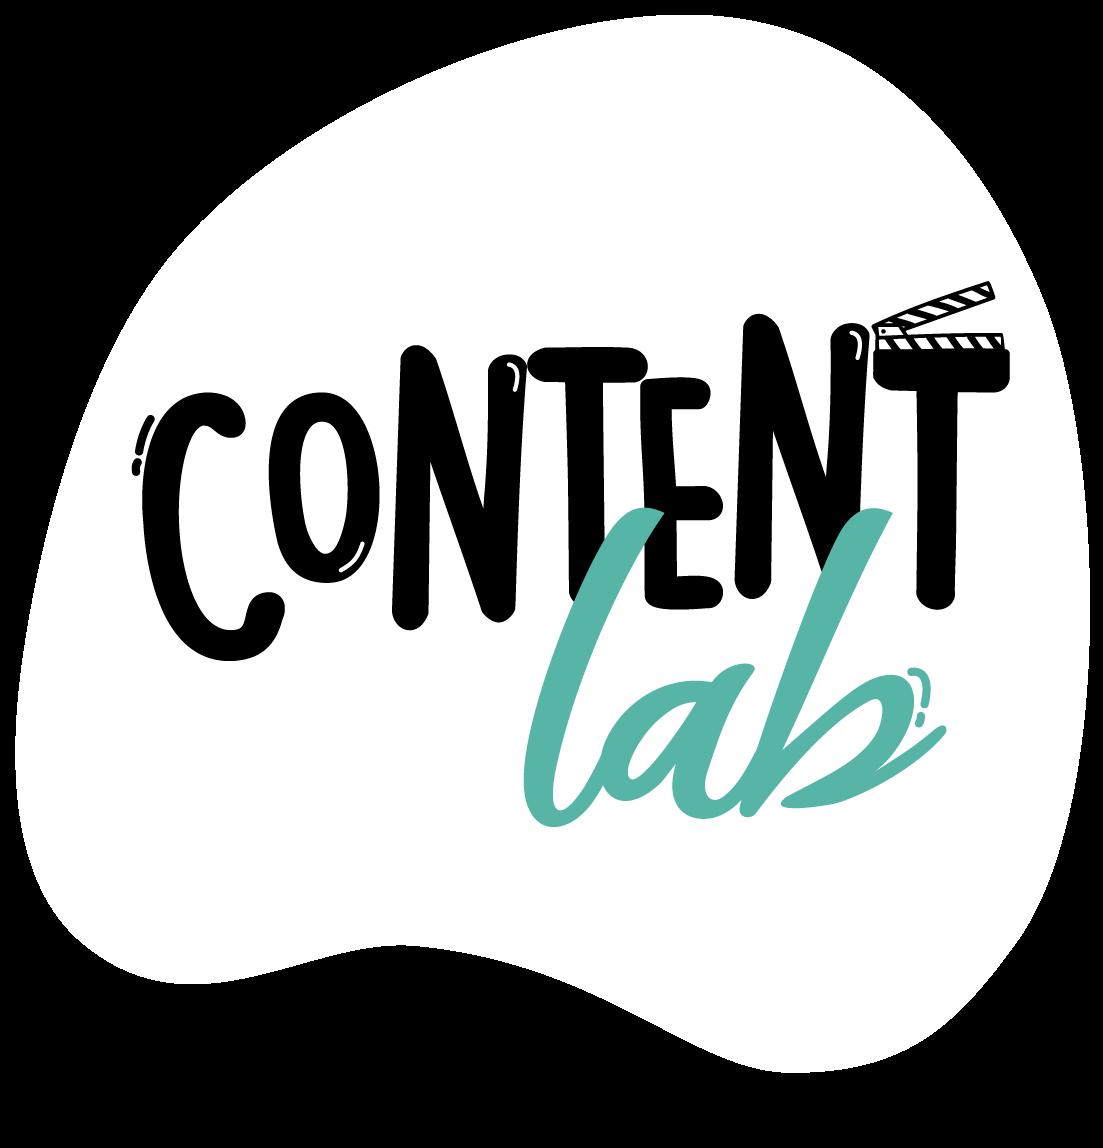 ContentLab - Creative ideas